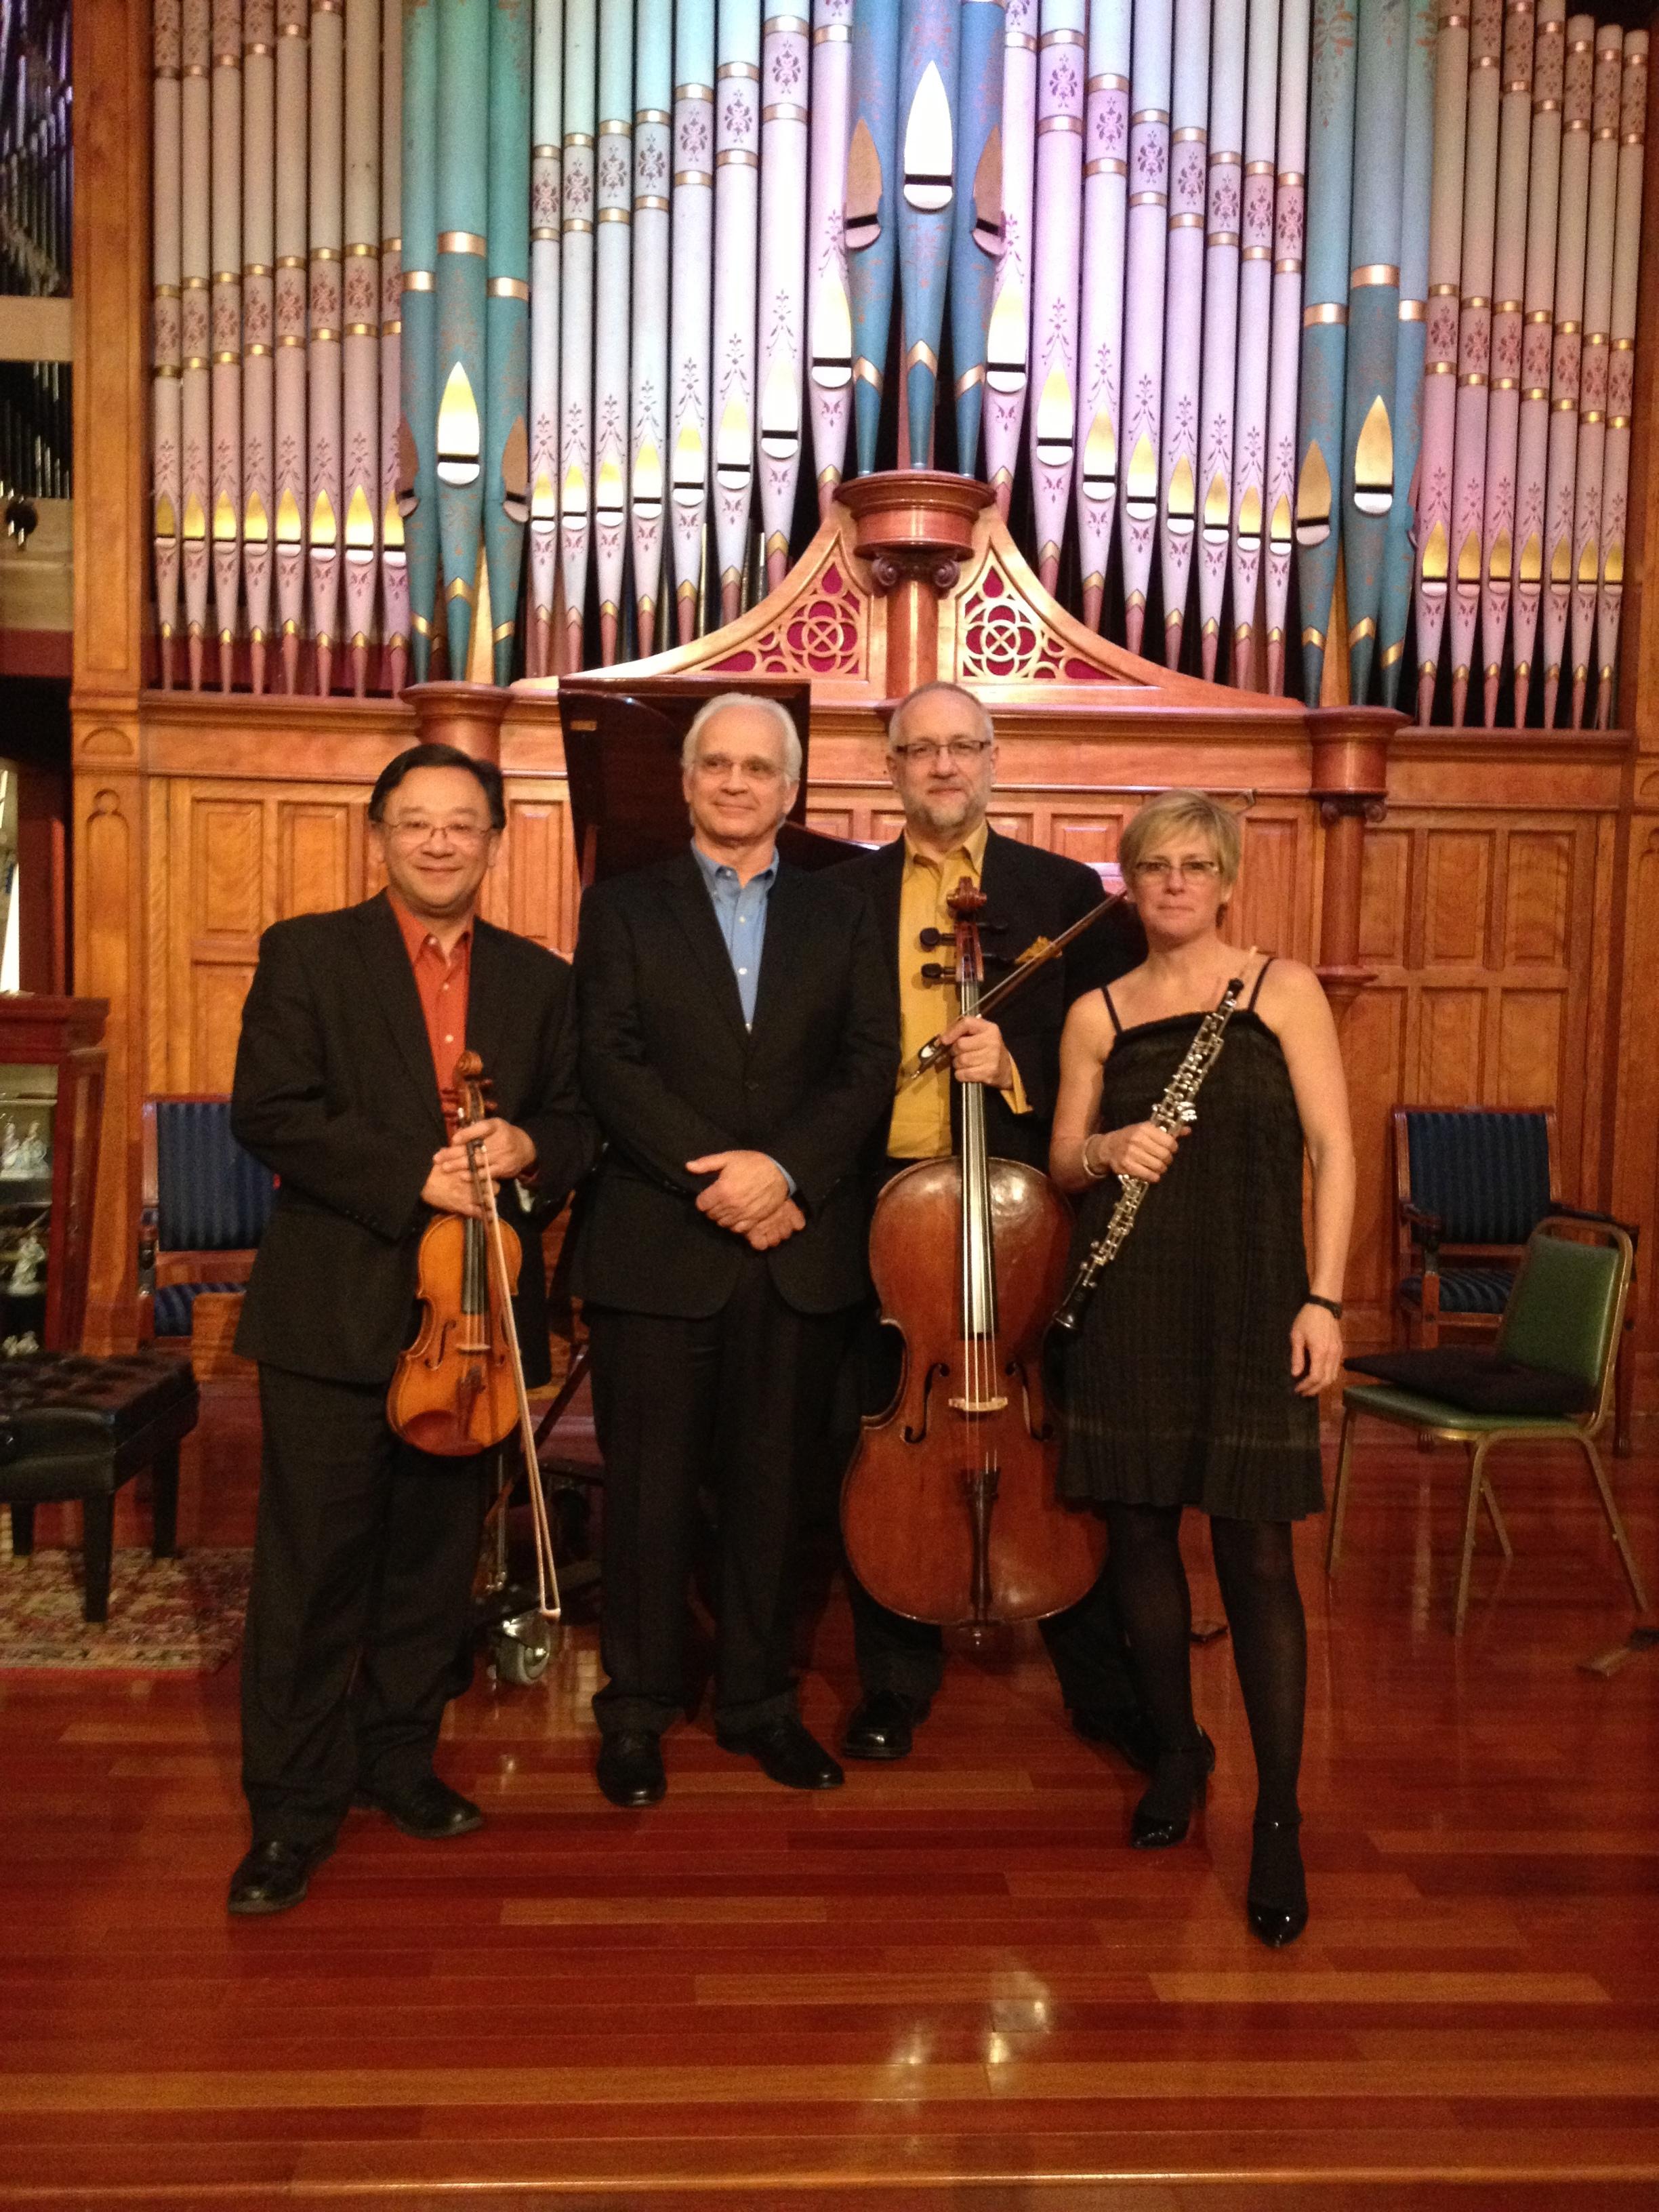 Deb Stevenson,  oboe ; Thomas Yang,  violin ;   Steven Houser,  cello ; George Radosavljevic,  piano